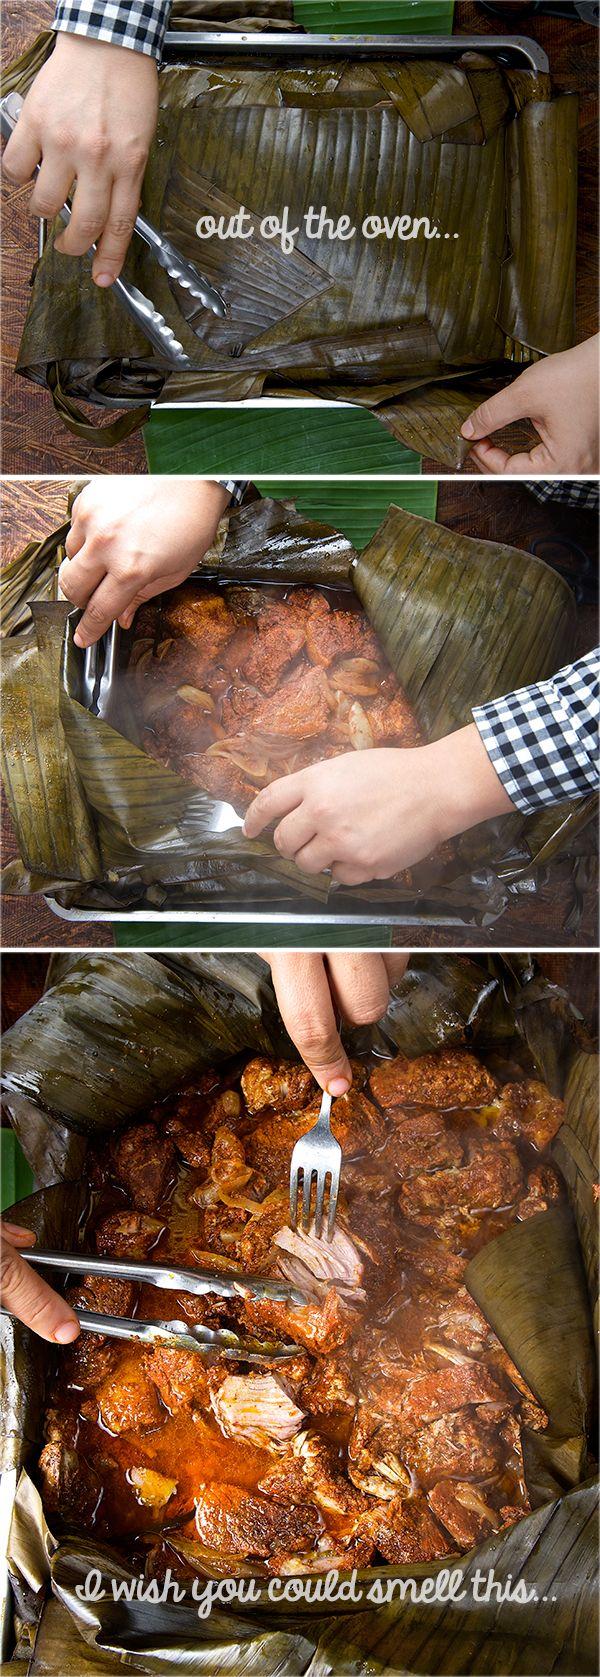 Cochinita-Pibil_Yucatan-Style_Yes,-more-please!